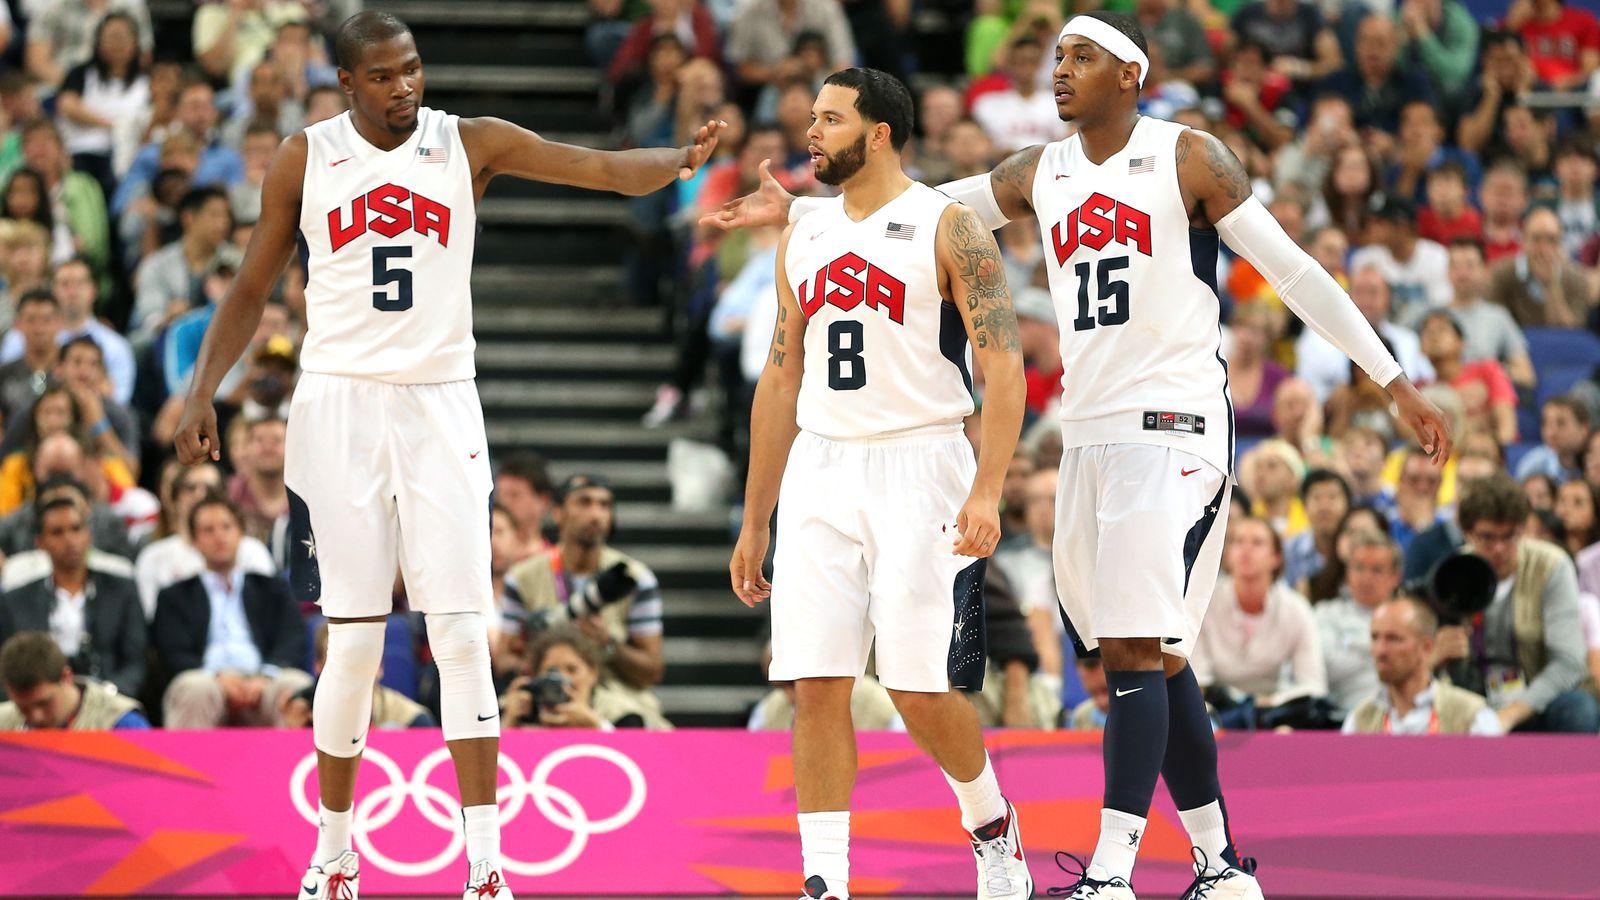 Team Usa Vs Spain Basketball 2012 Olympics Gold Medal